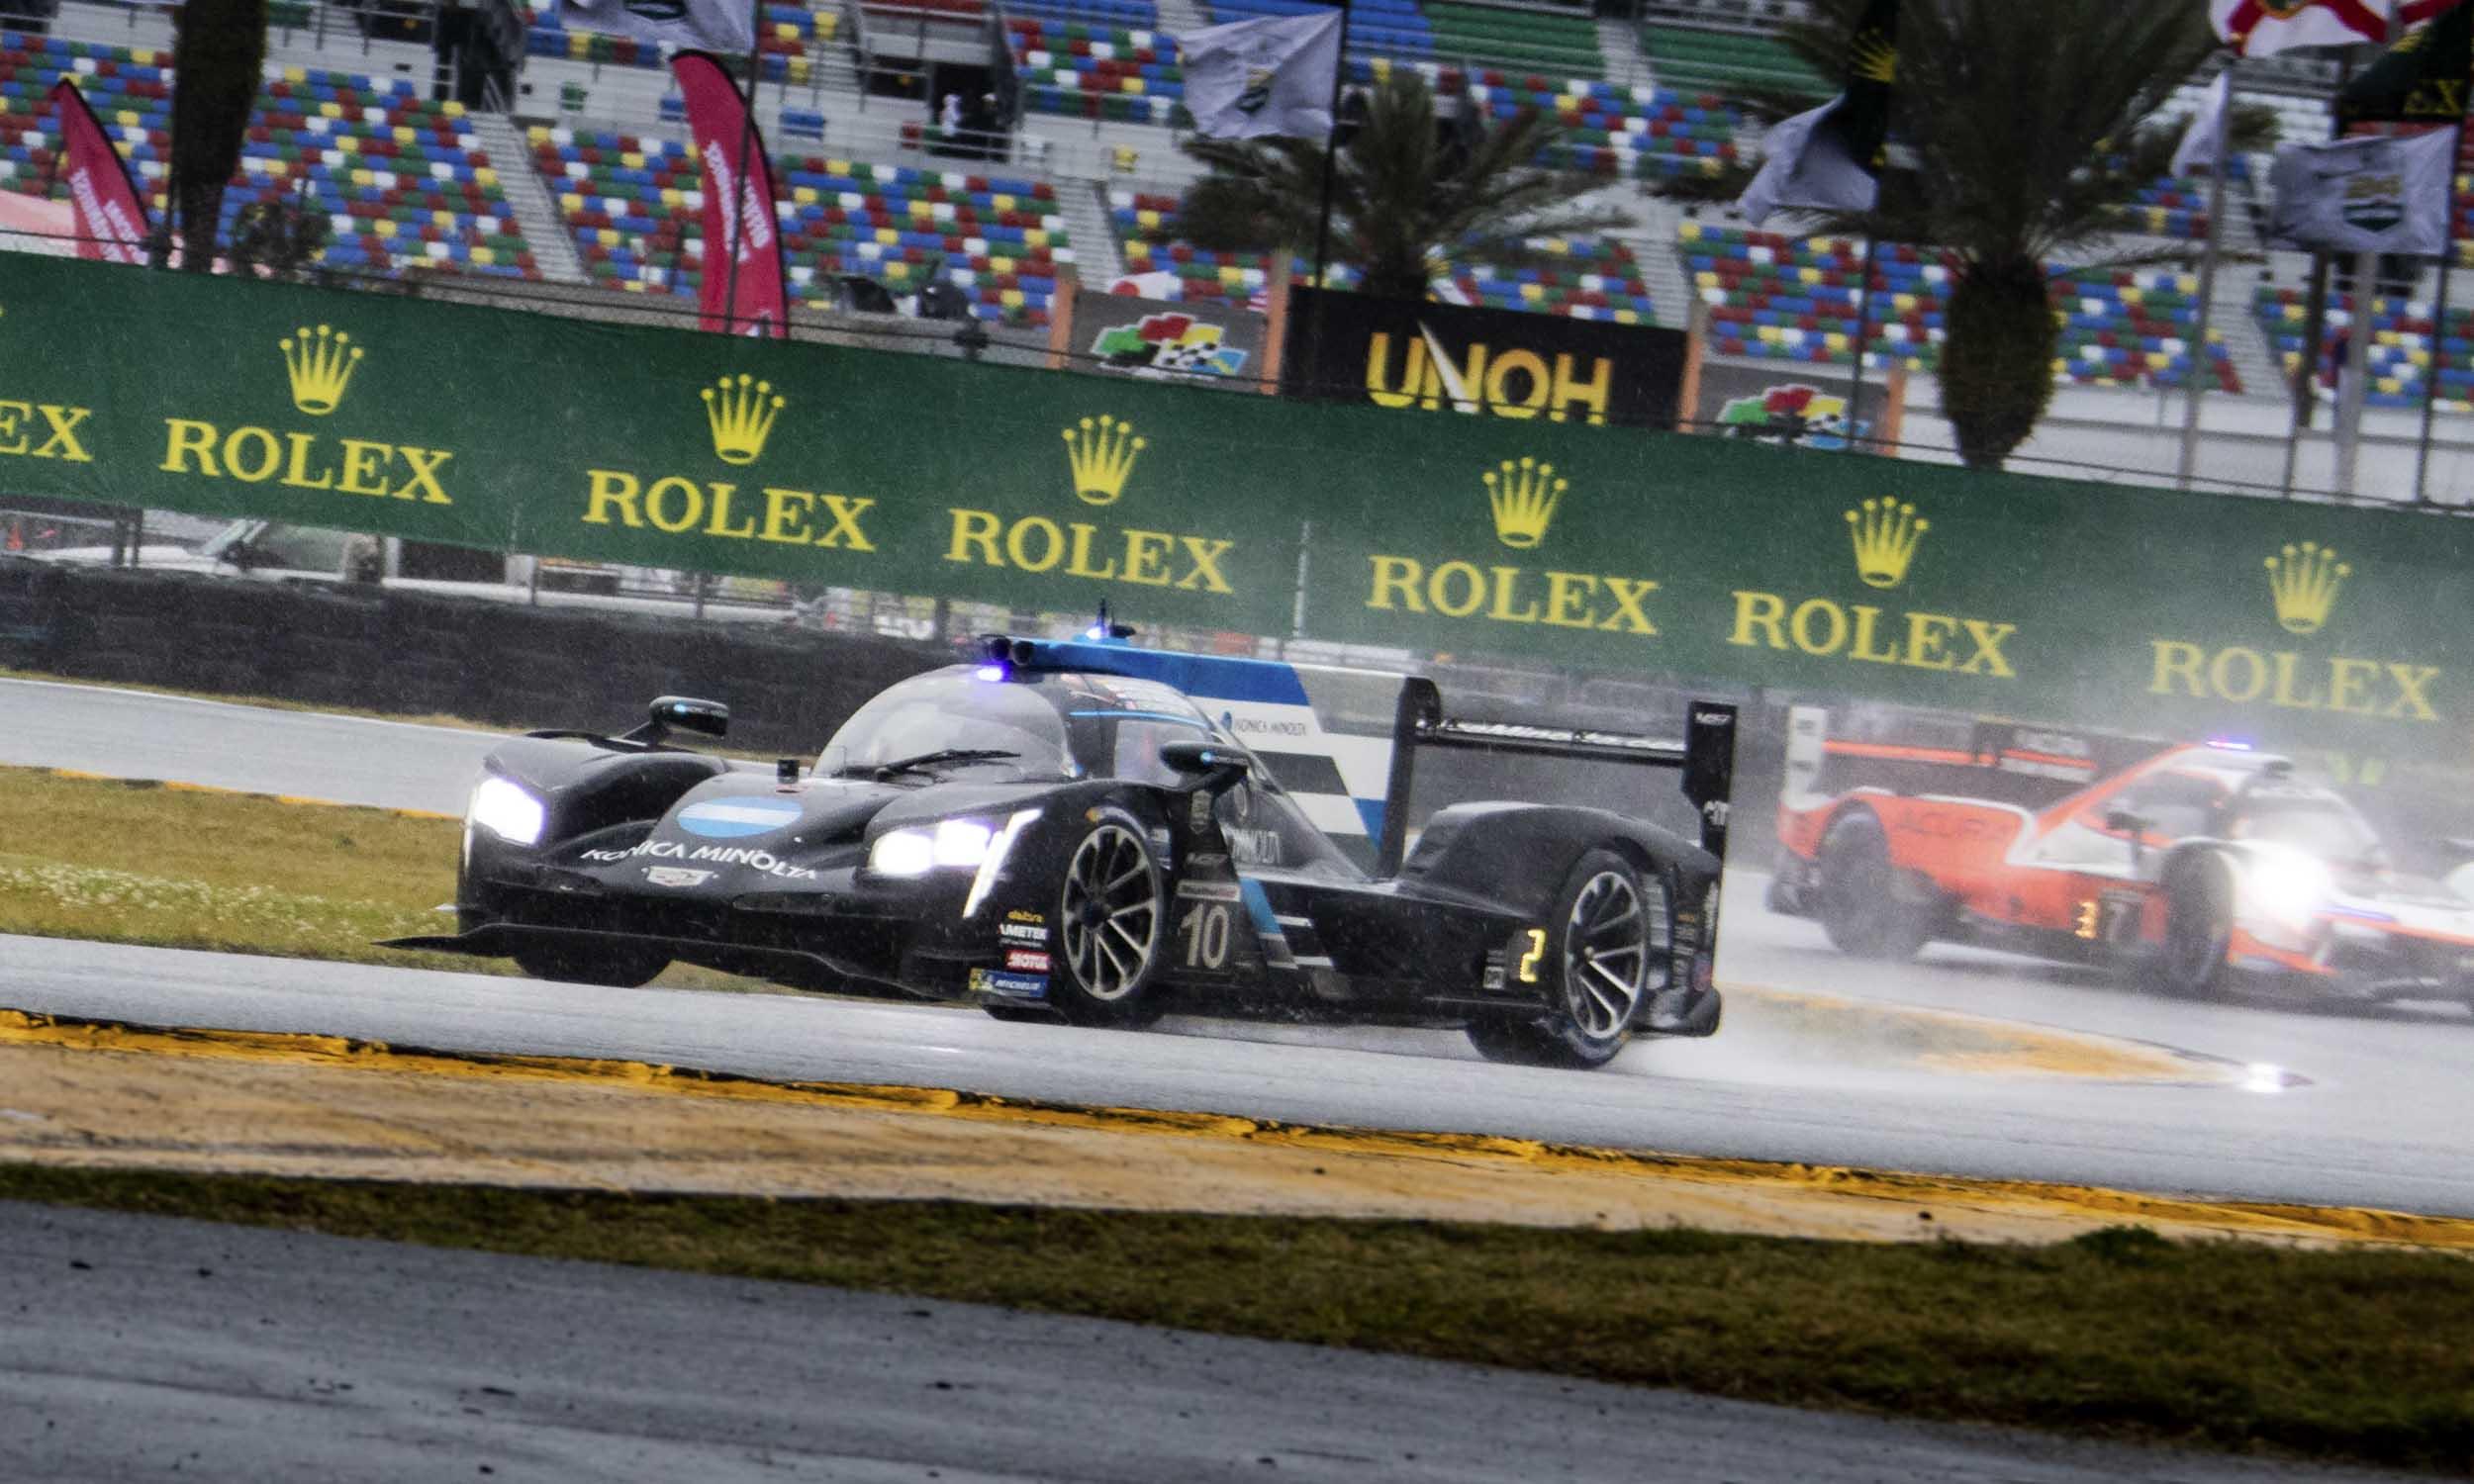 2019 Rolex 24 At Daytona Race Wrapnbsp